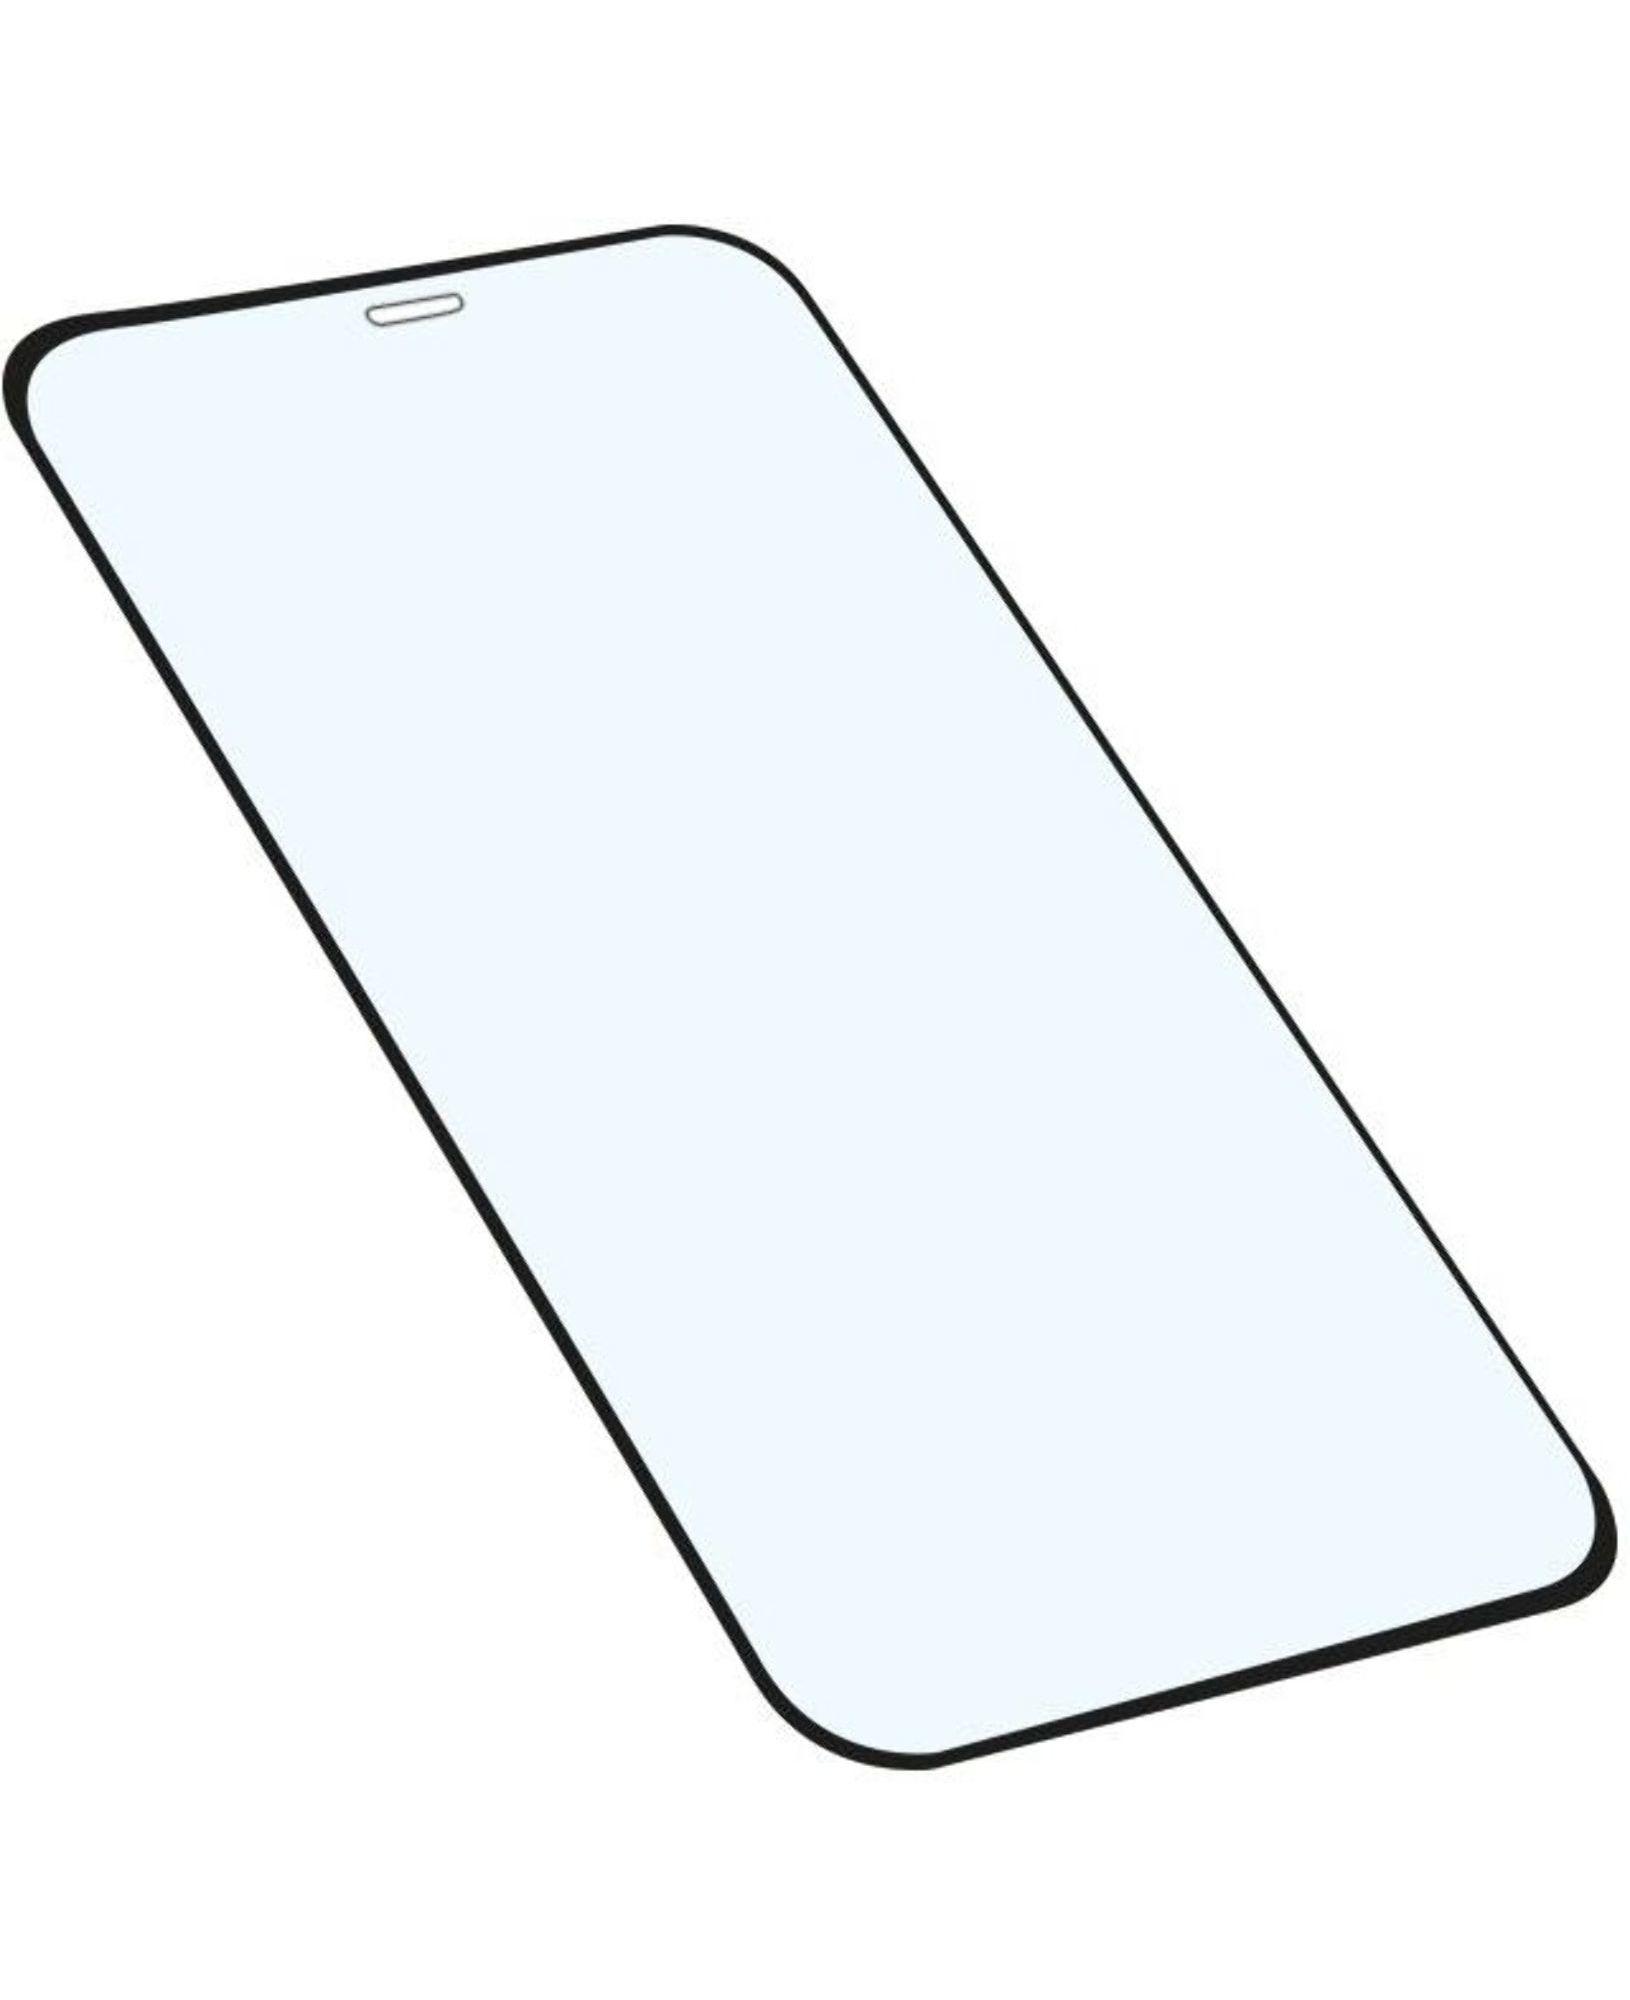 Cellular Line - Glassgo3diph961k